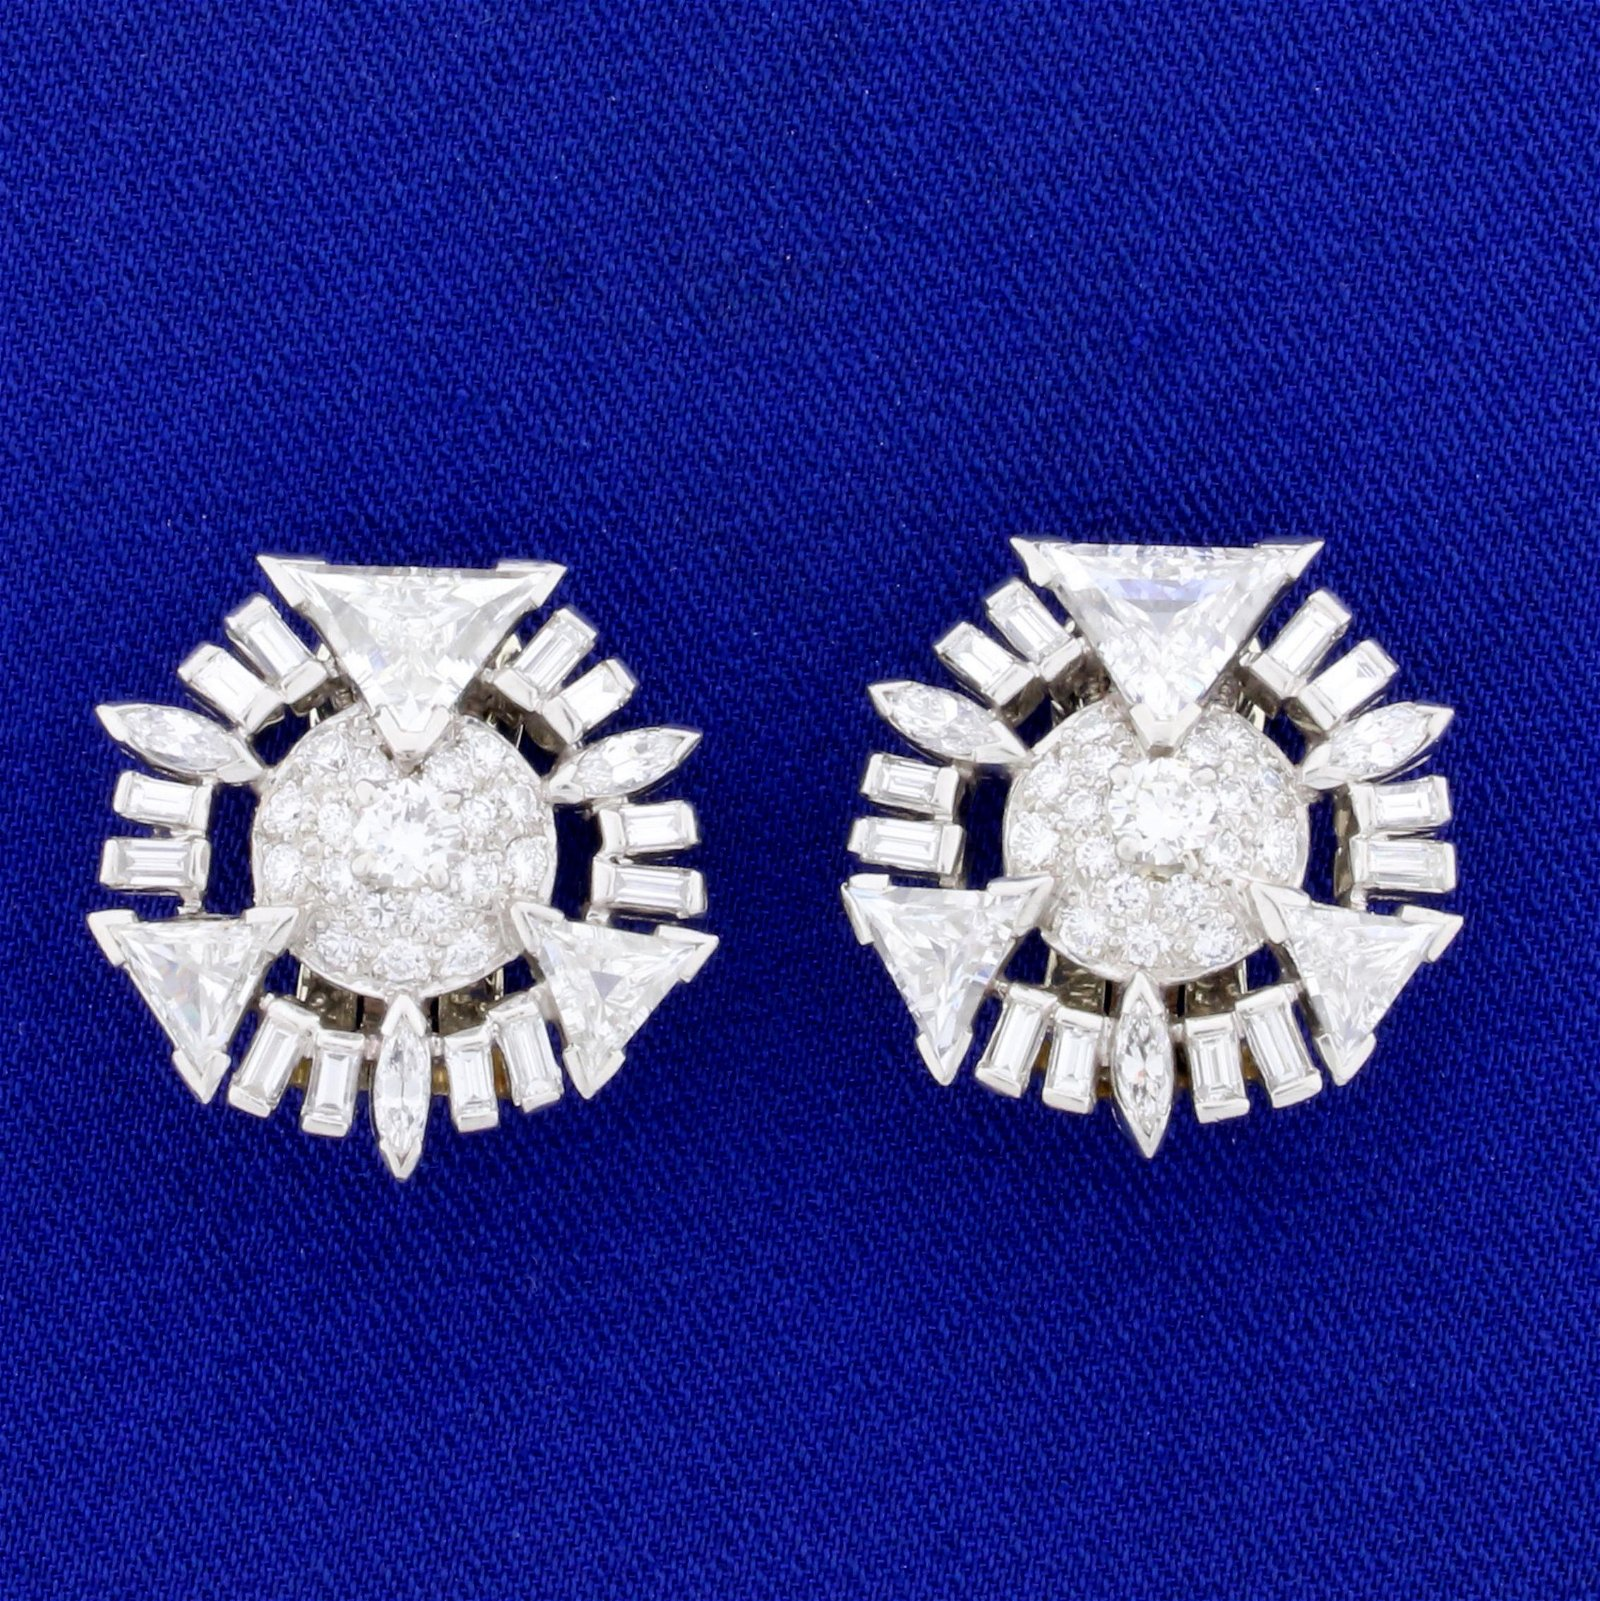 Vintage 10ct TW Trillion, Round, and Baguette Diamond